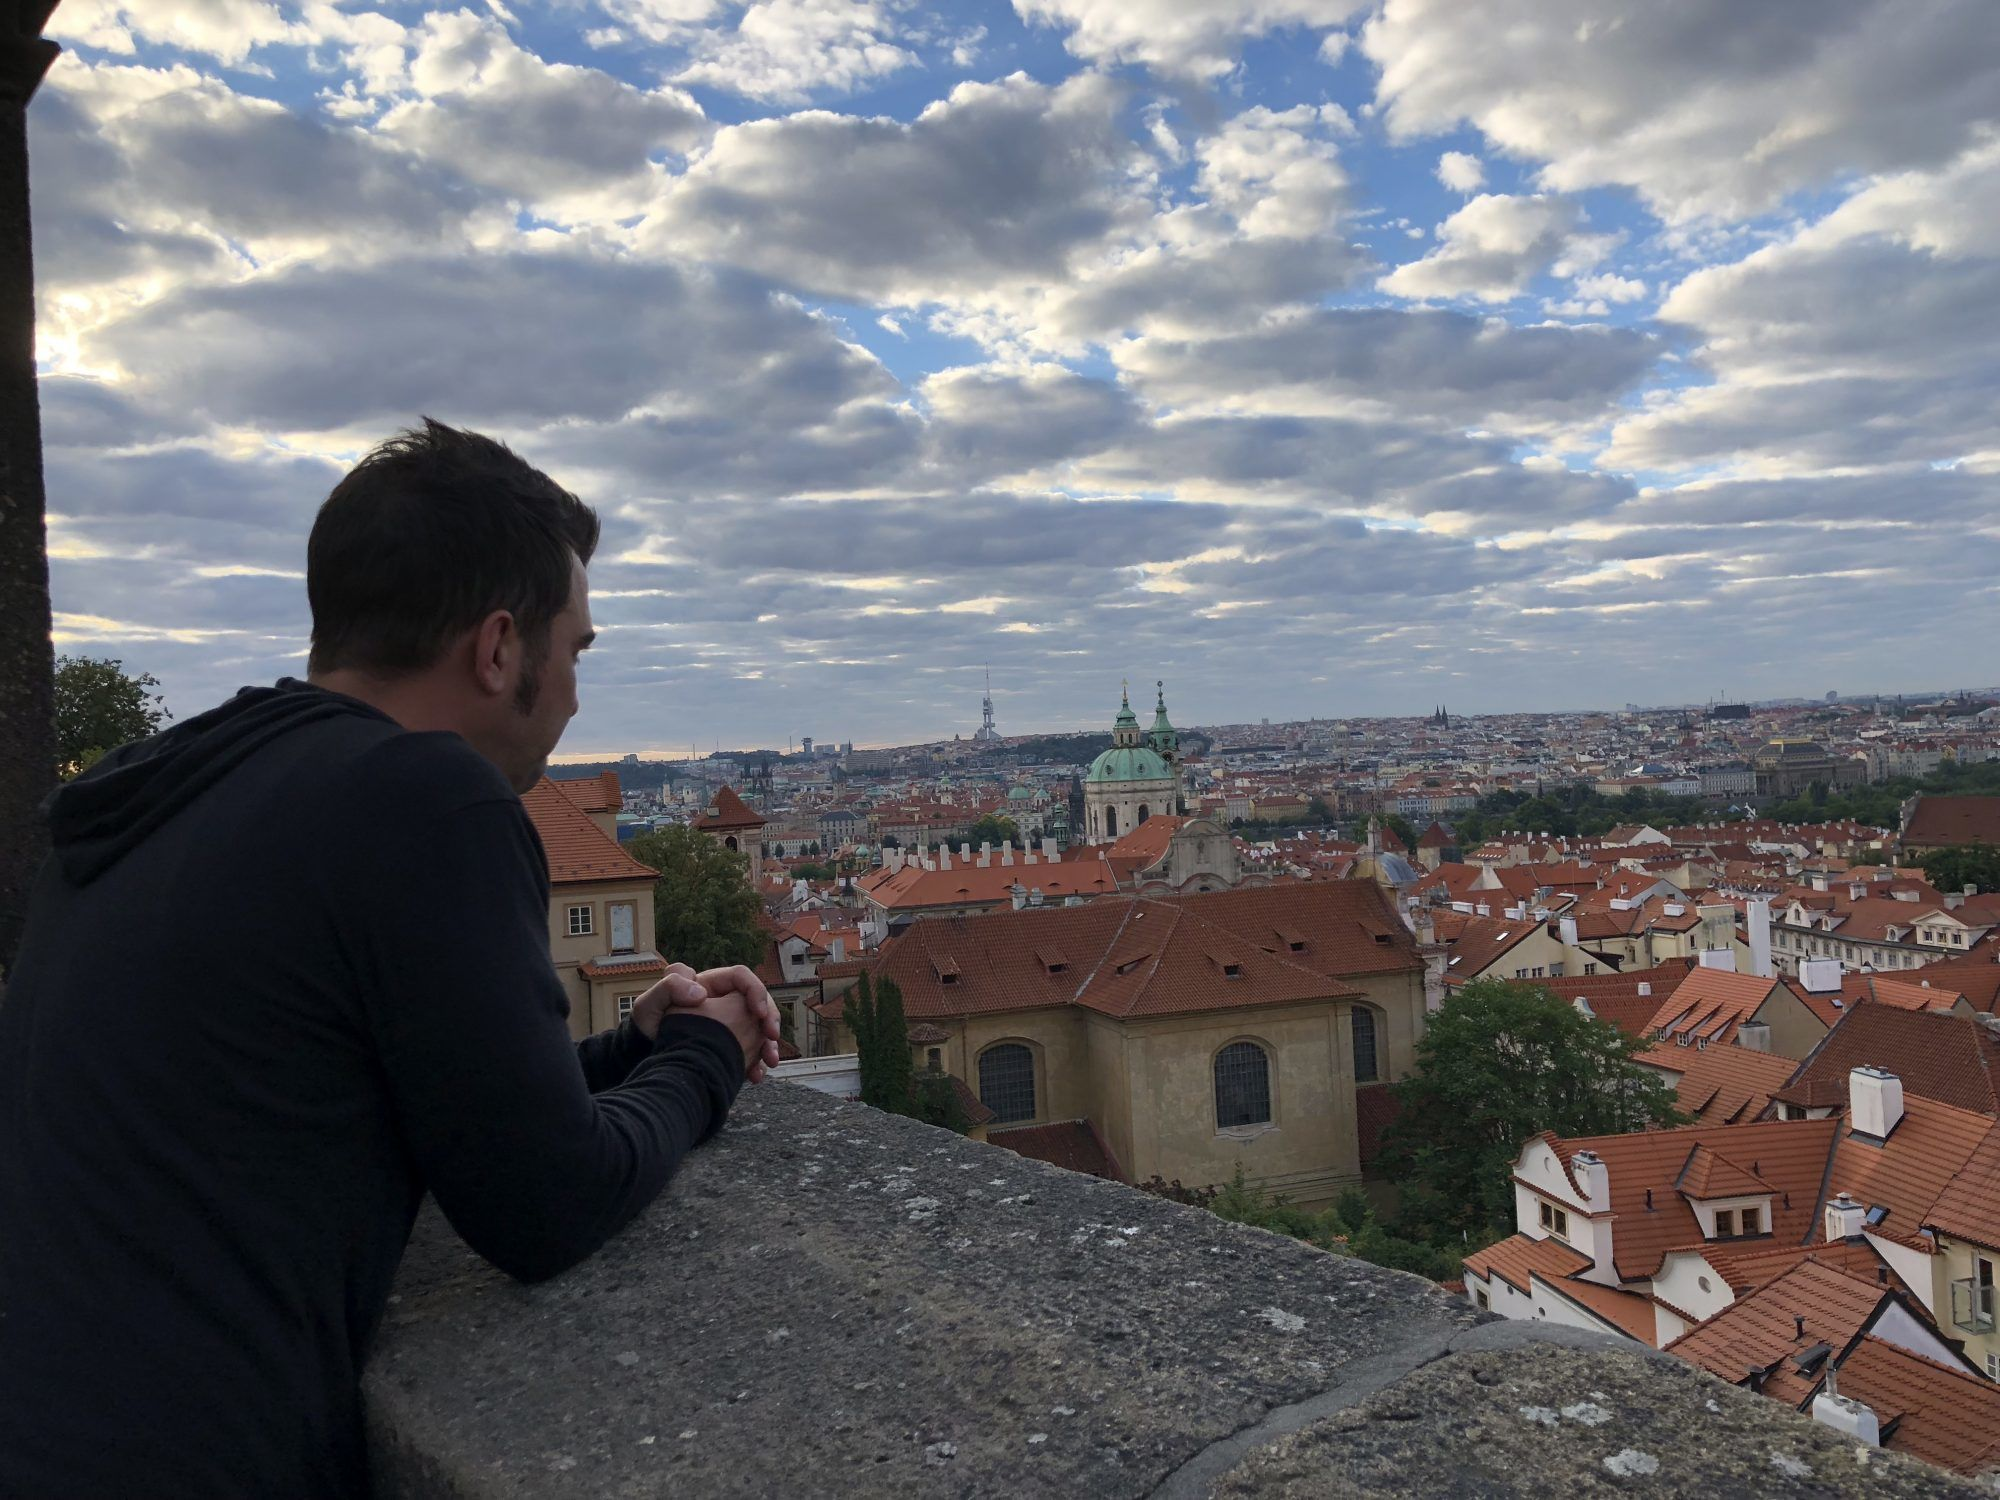 prague castle amazing views must see